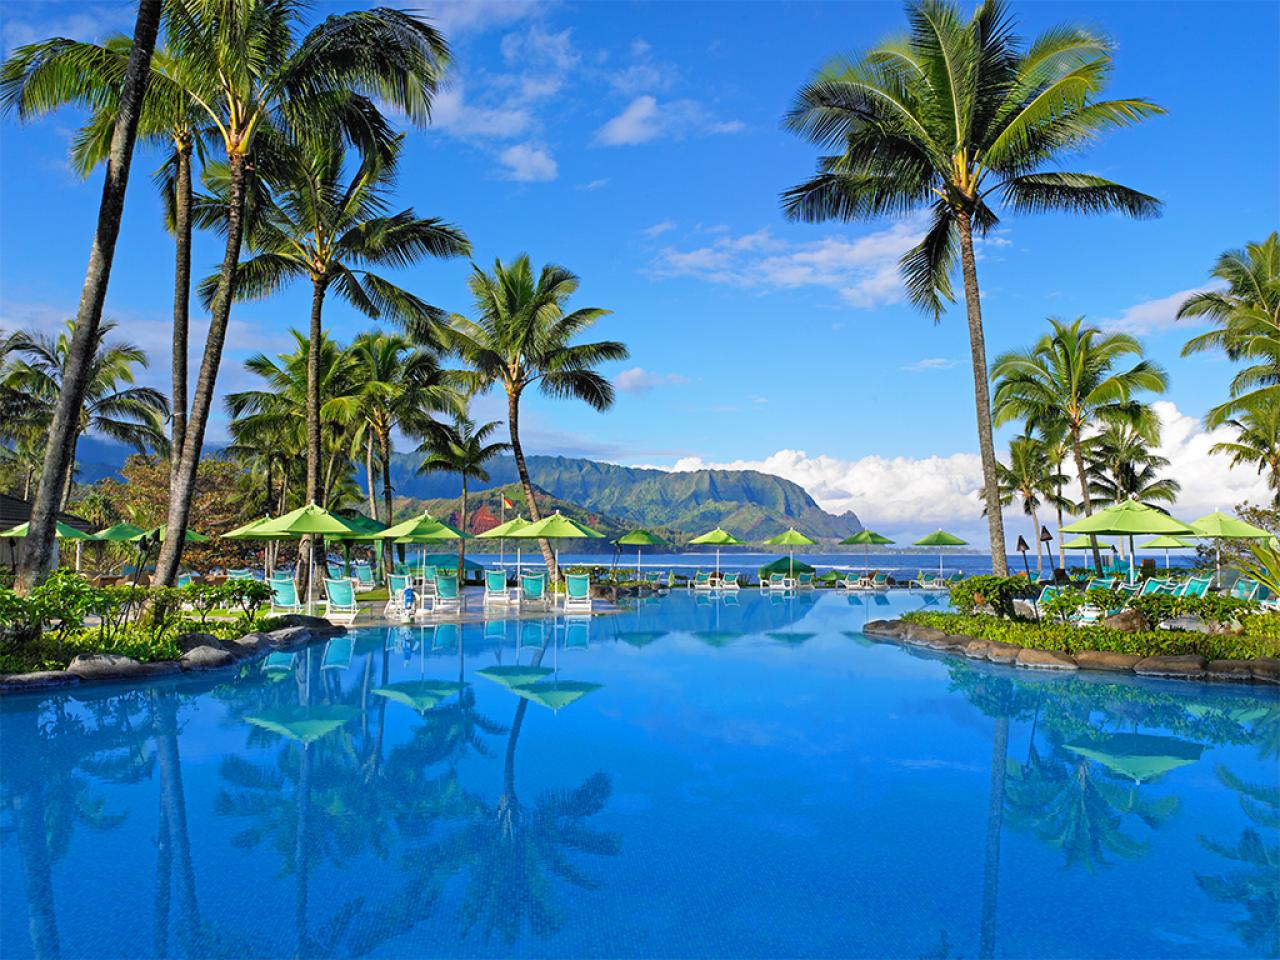 best hawaiian island to visit